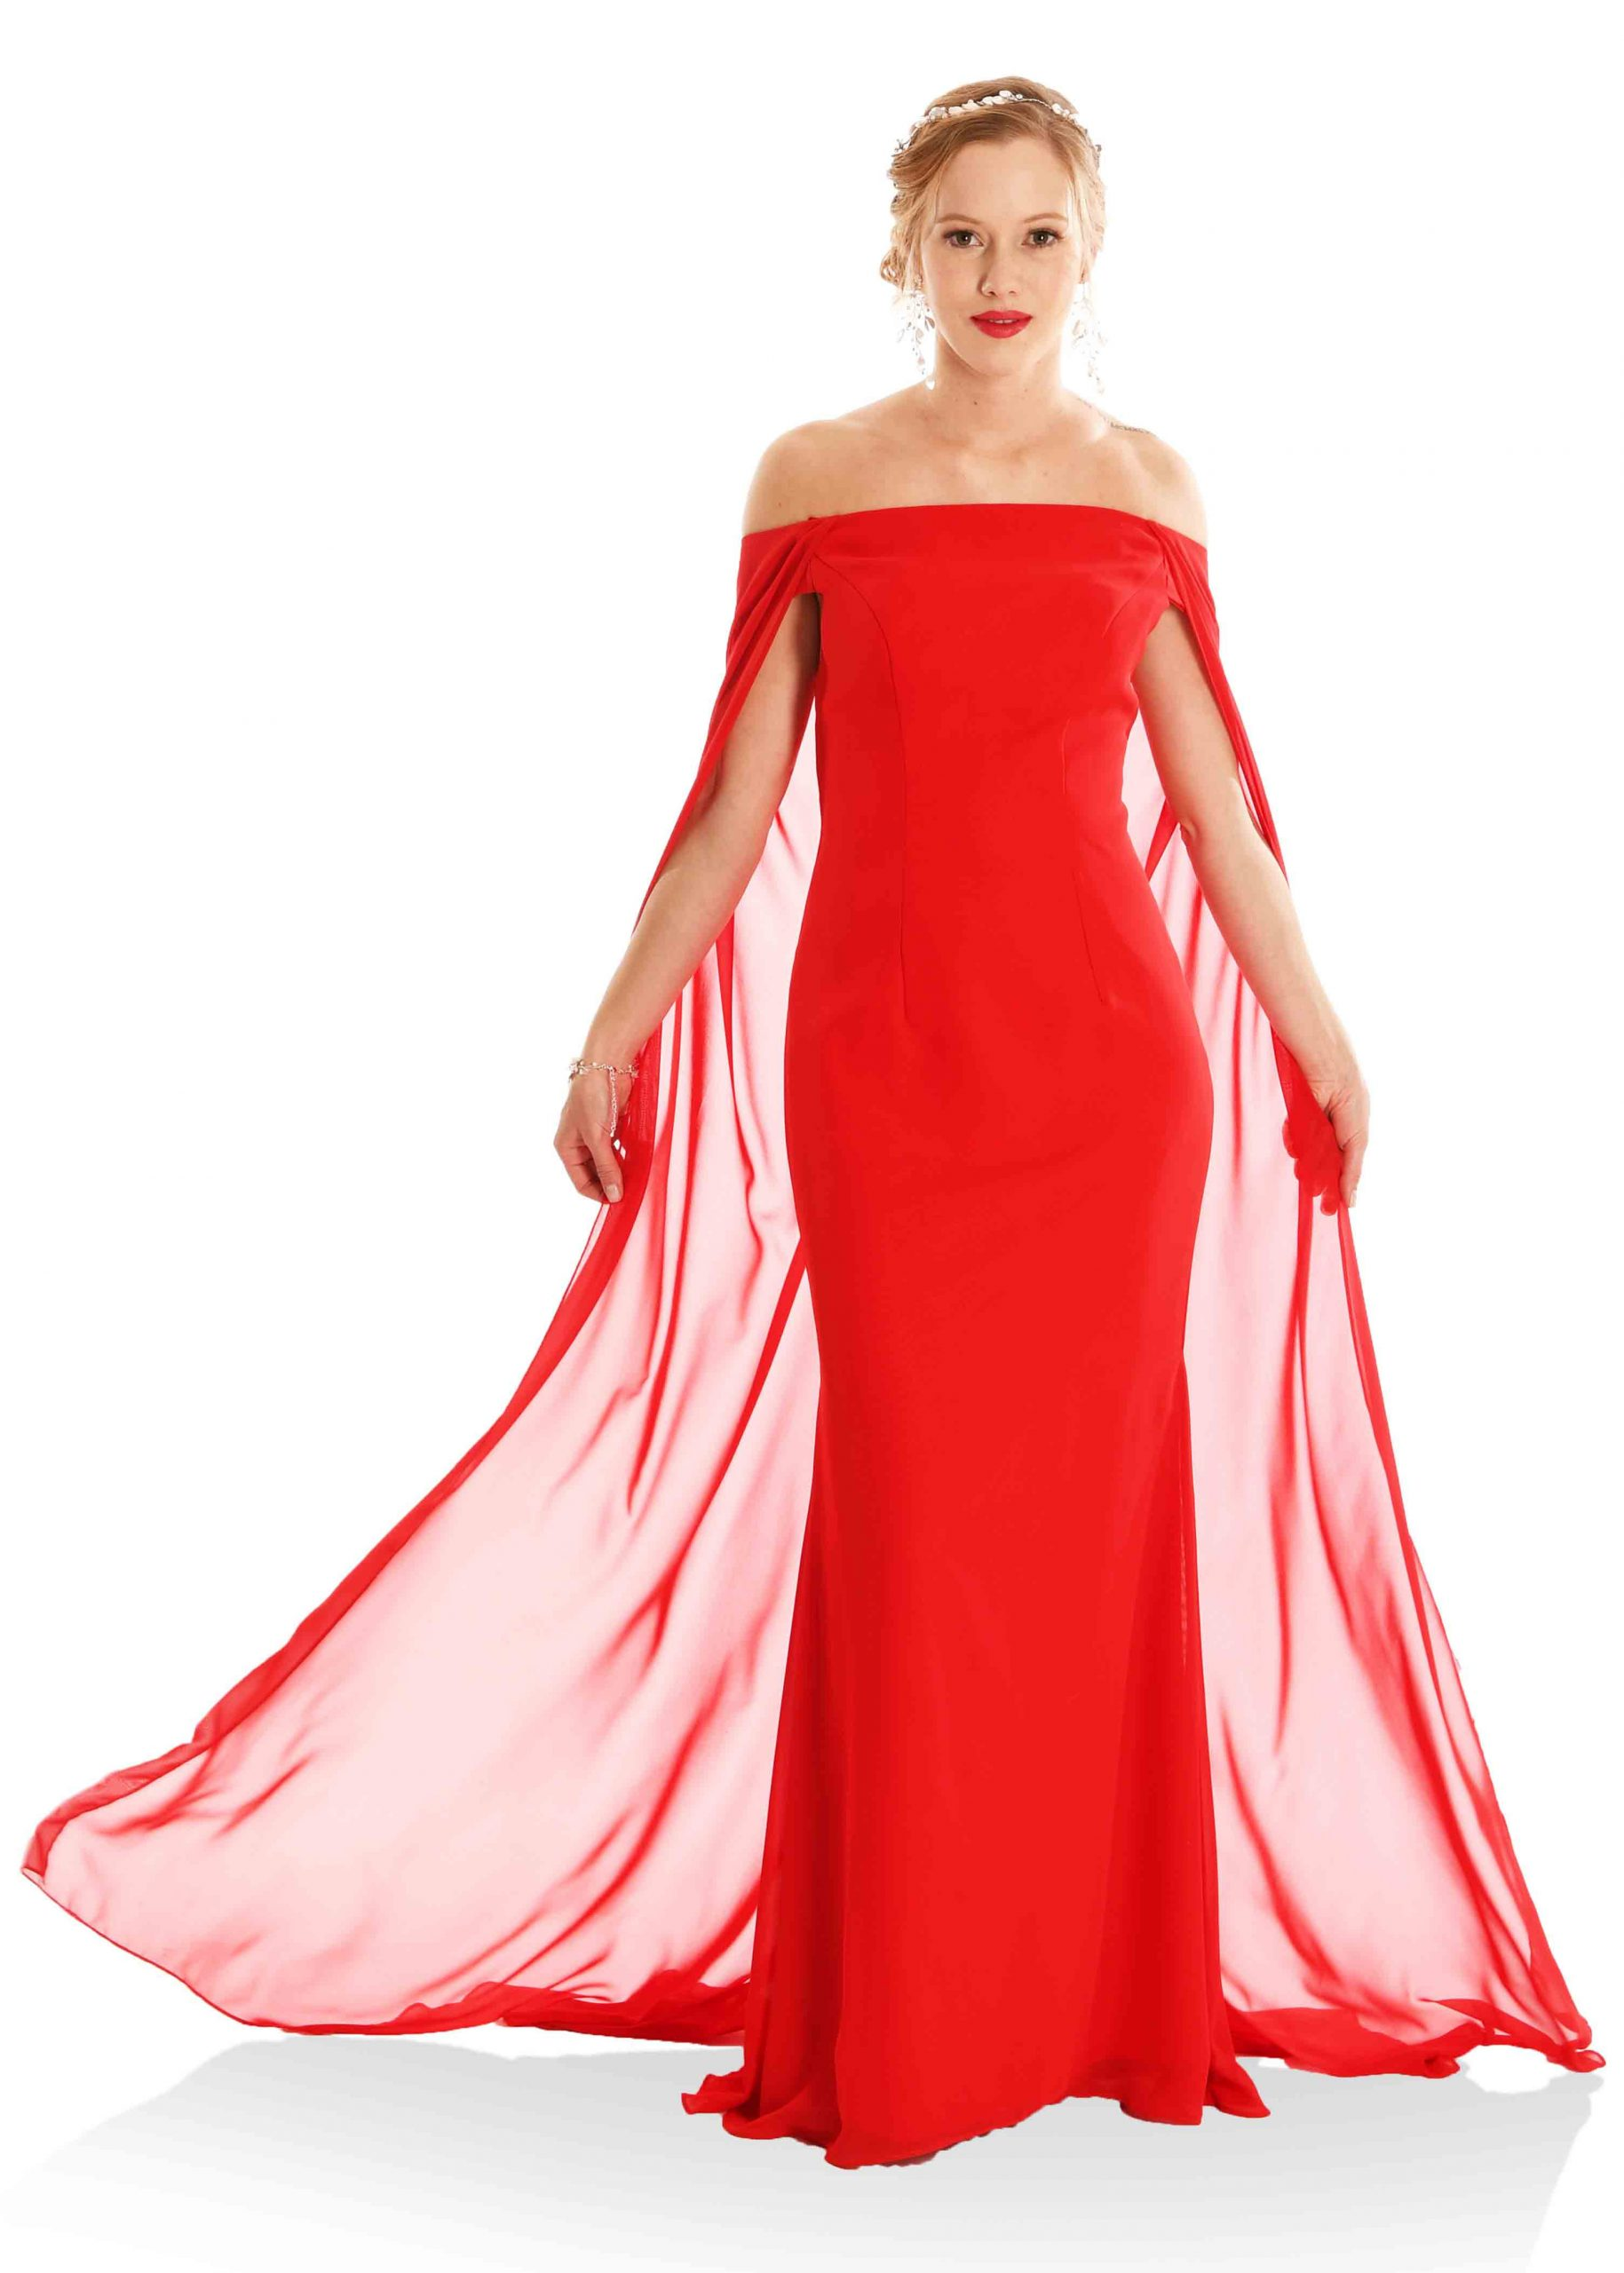 Abend Wunderbar Damen Kleider Abendmode GalerieFormal Leicht Damen Kleider Abendmode Galerie